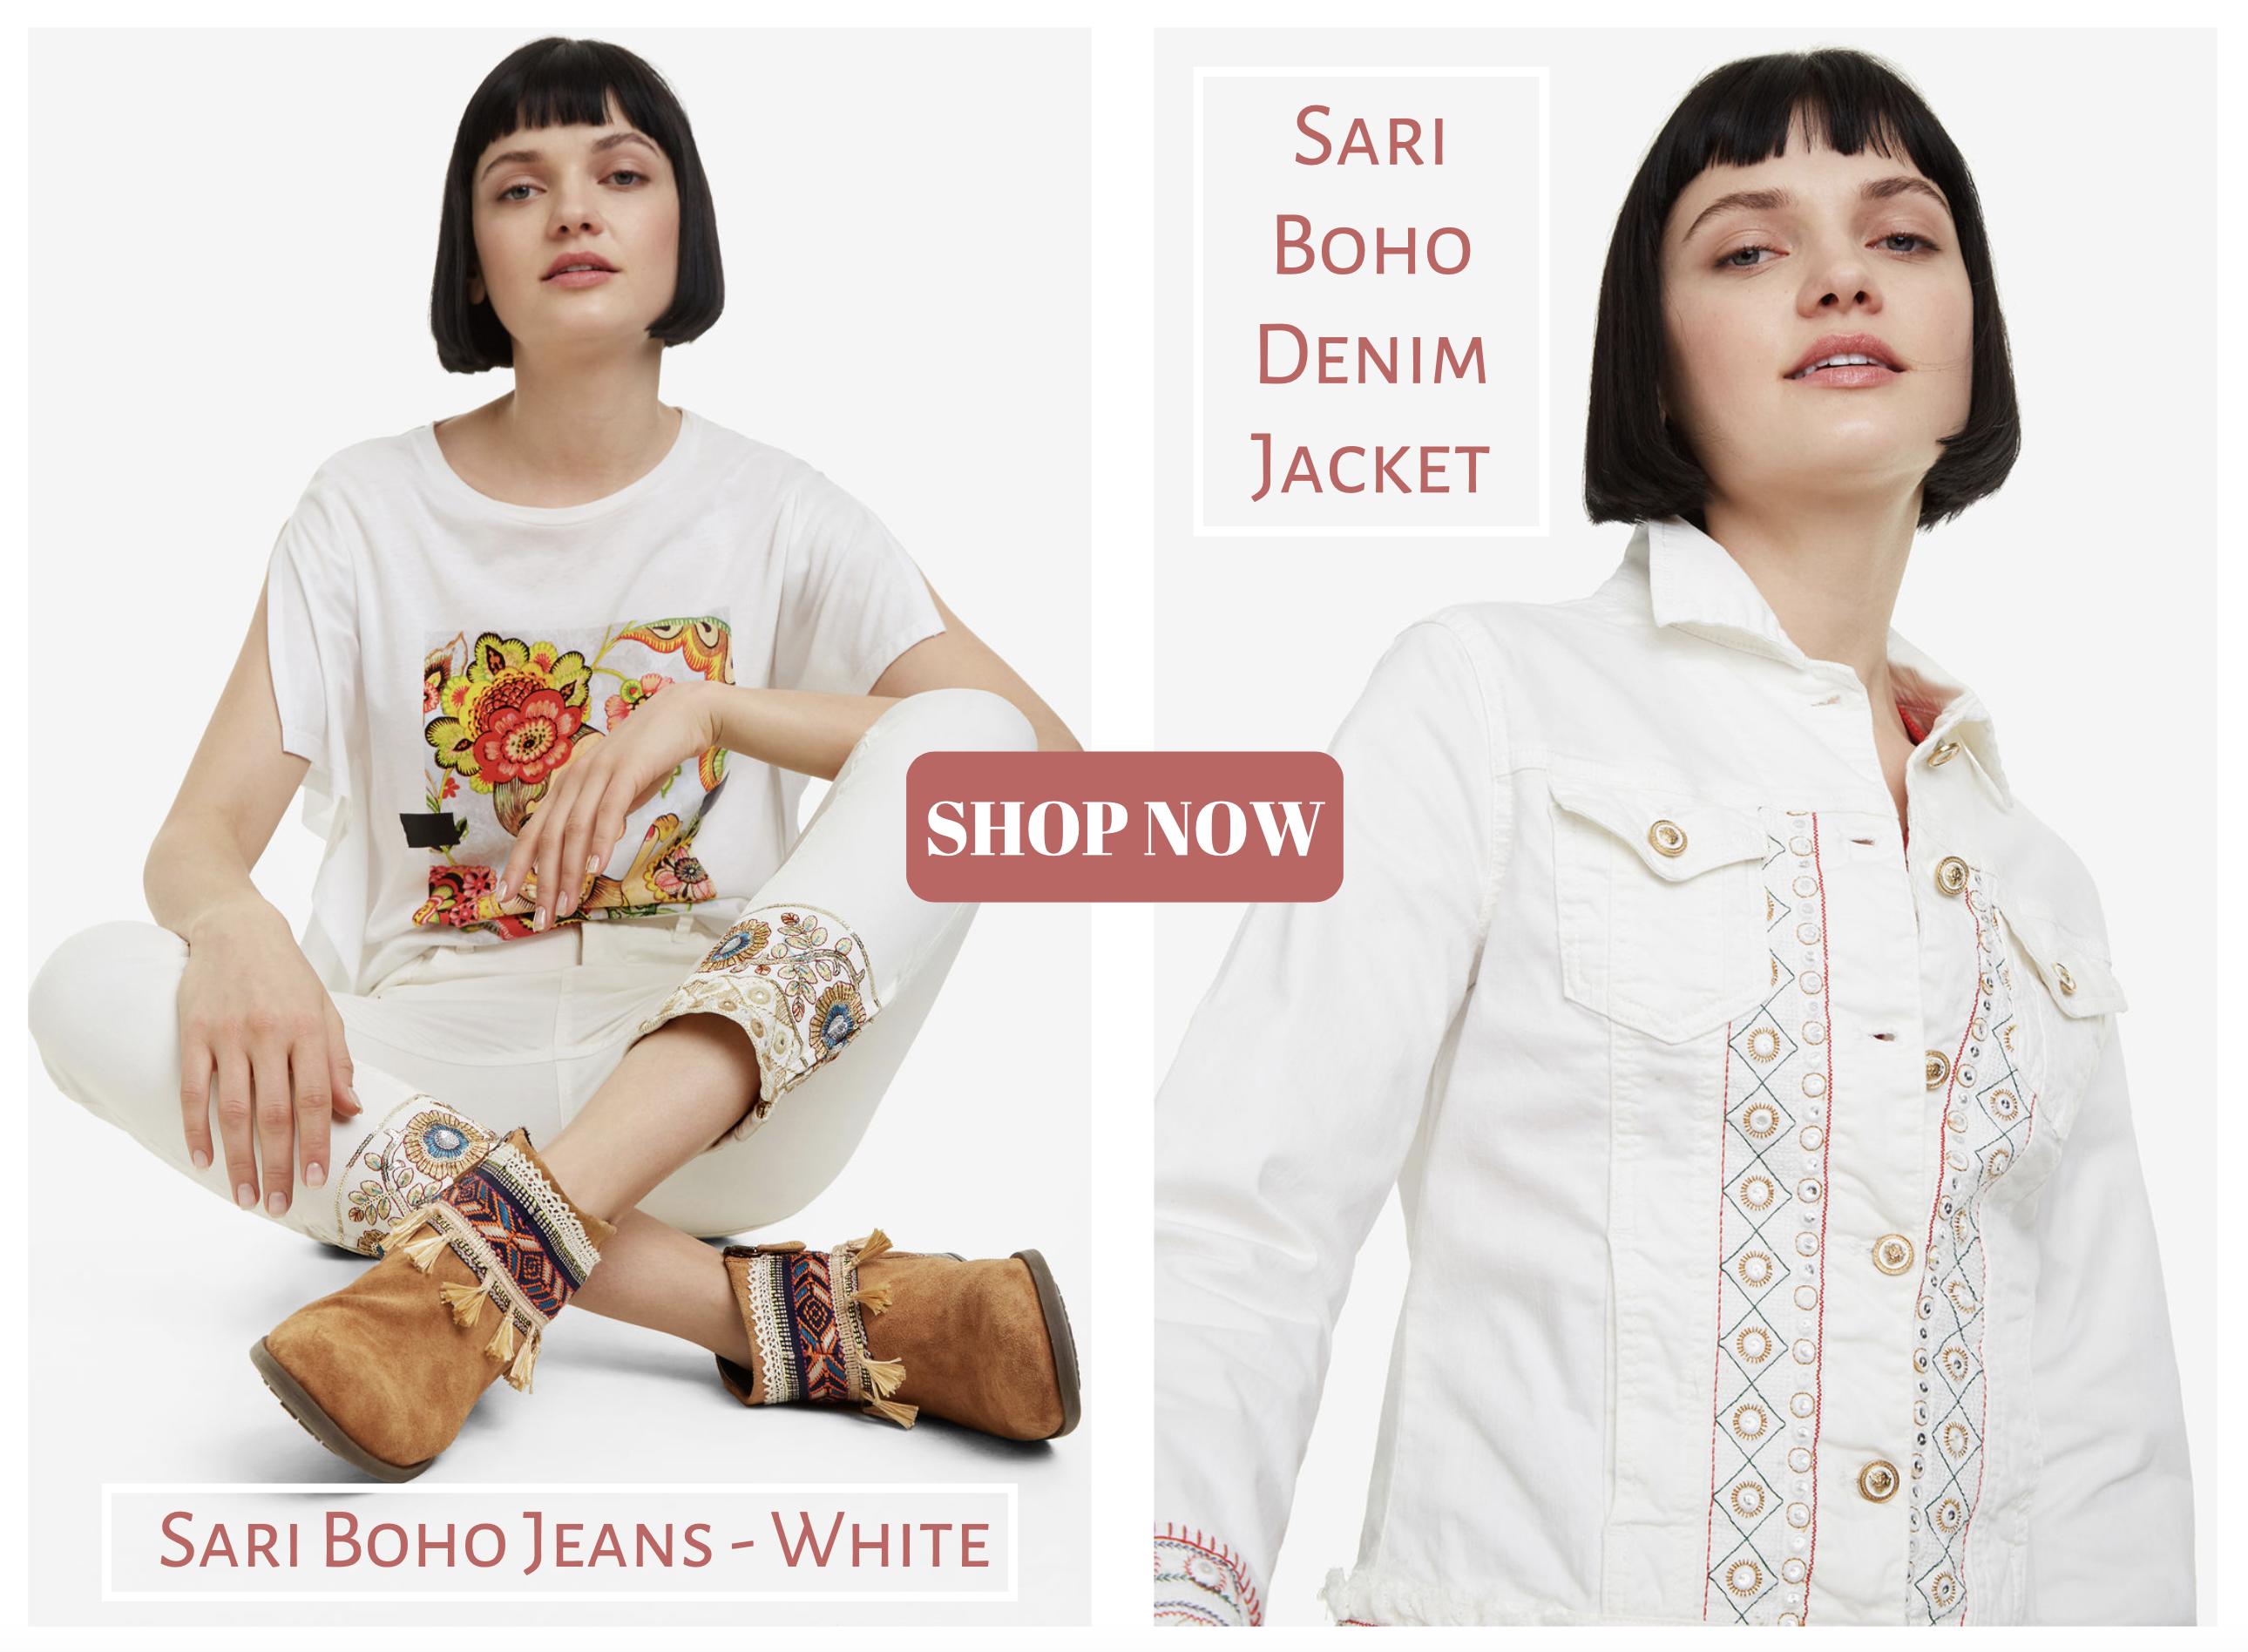 Desigual - Pizazz Boutique - Shop Desigual Online